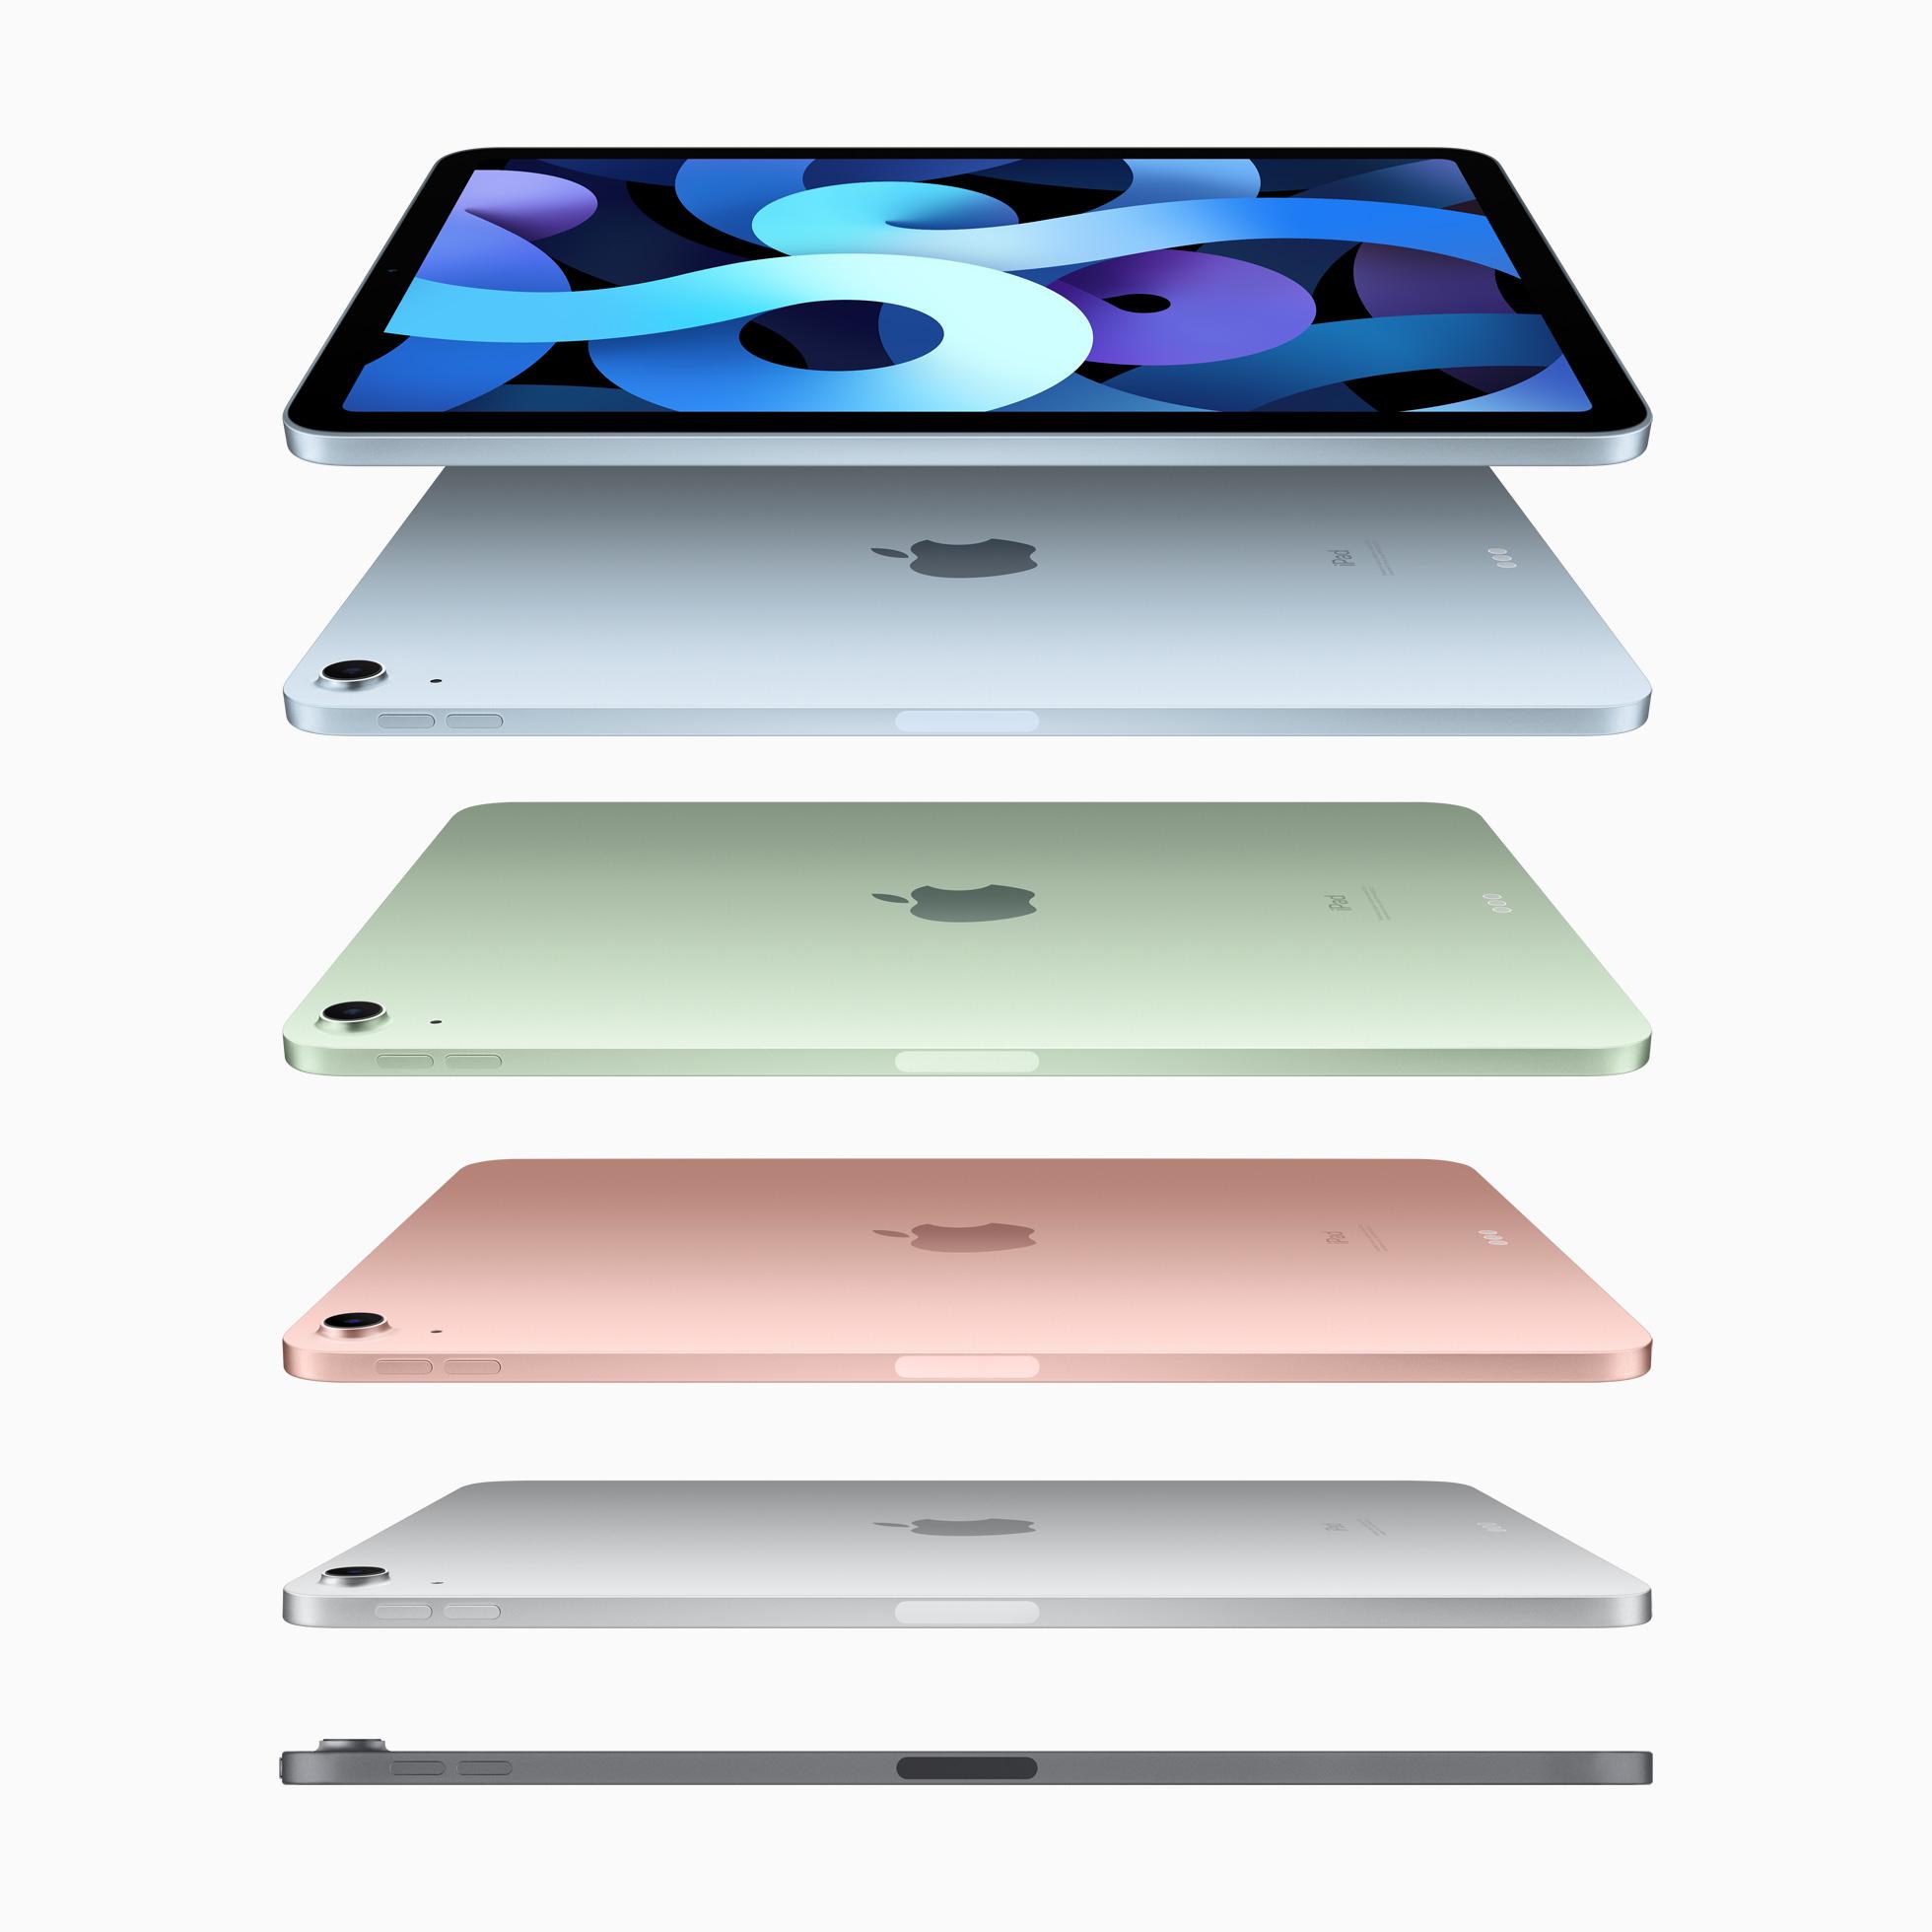 apple new-ipad-air new-design 09152020 big.jpg.large 2x